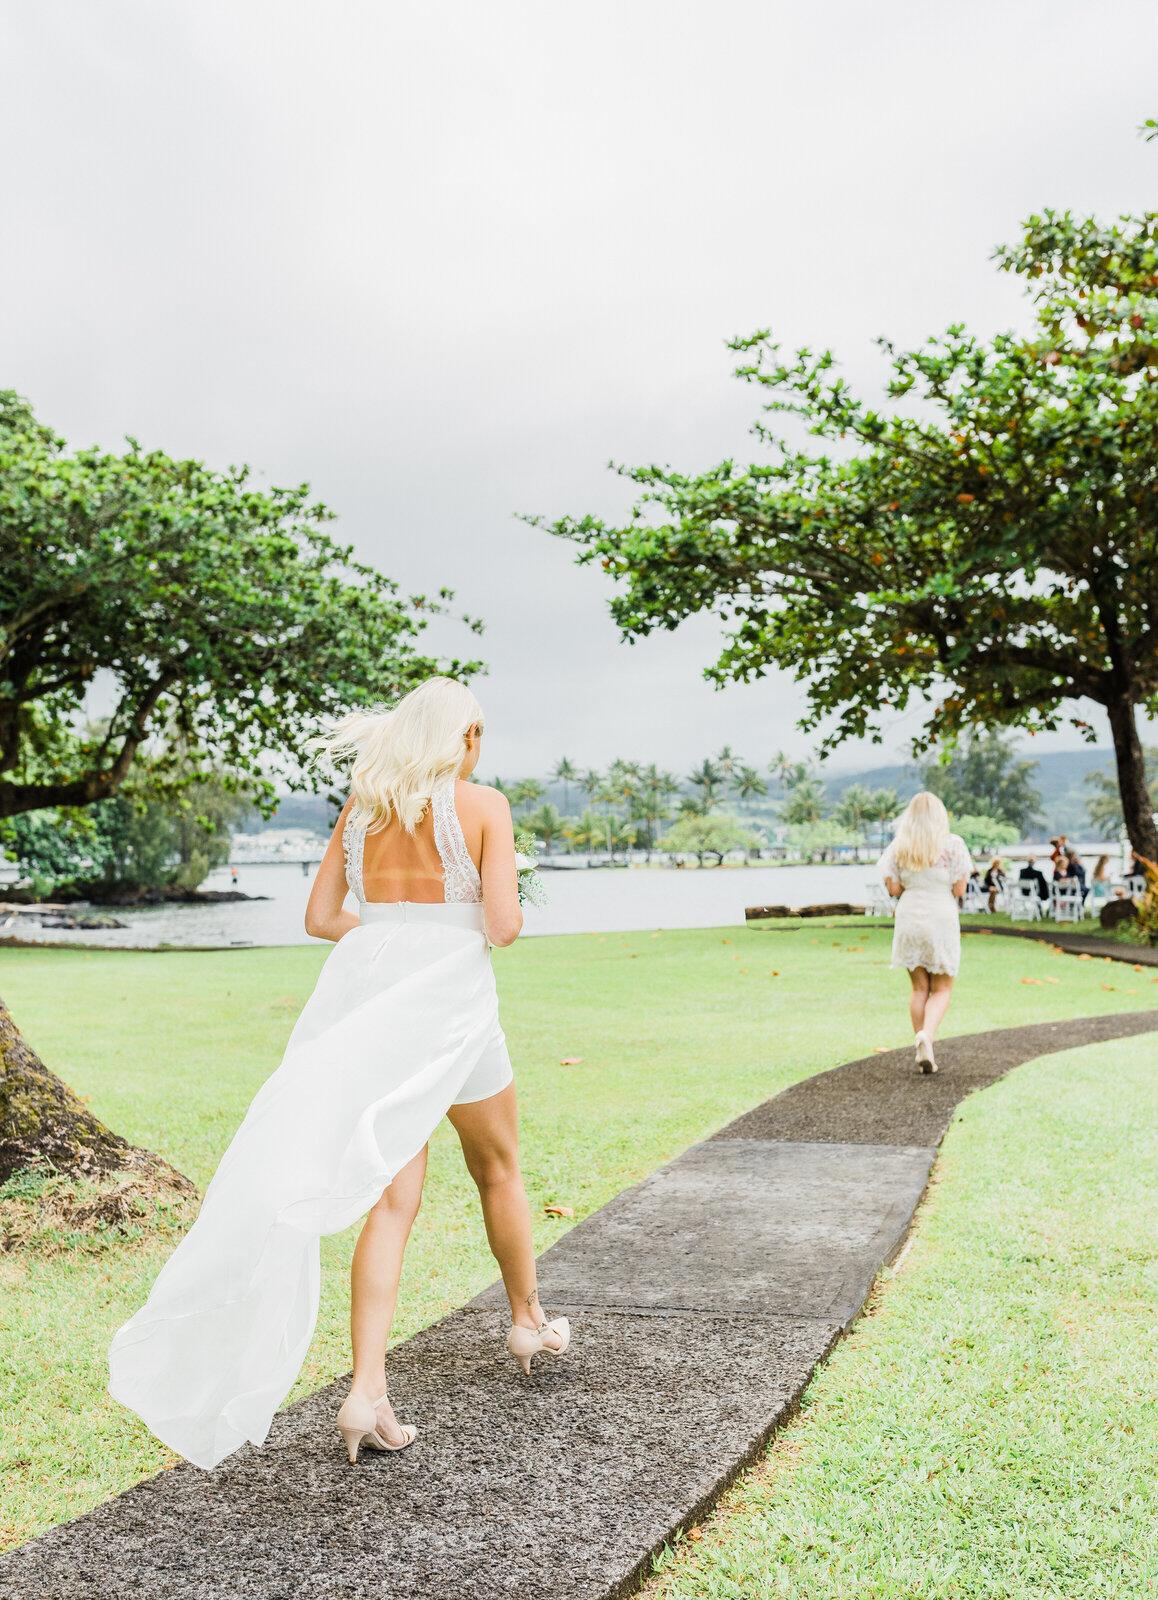 small-wedding-hawaii-destination-hilton-coconut-island-9650.jpg